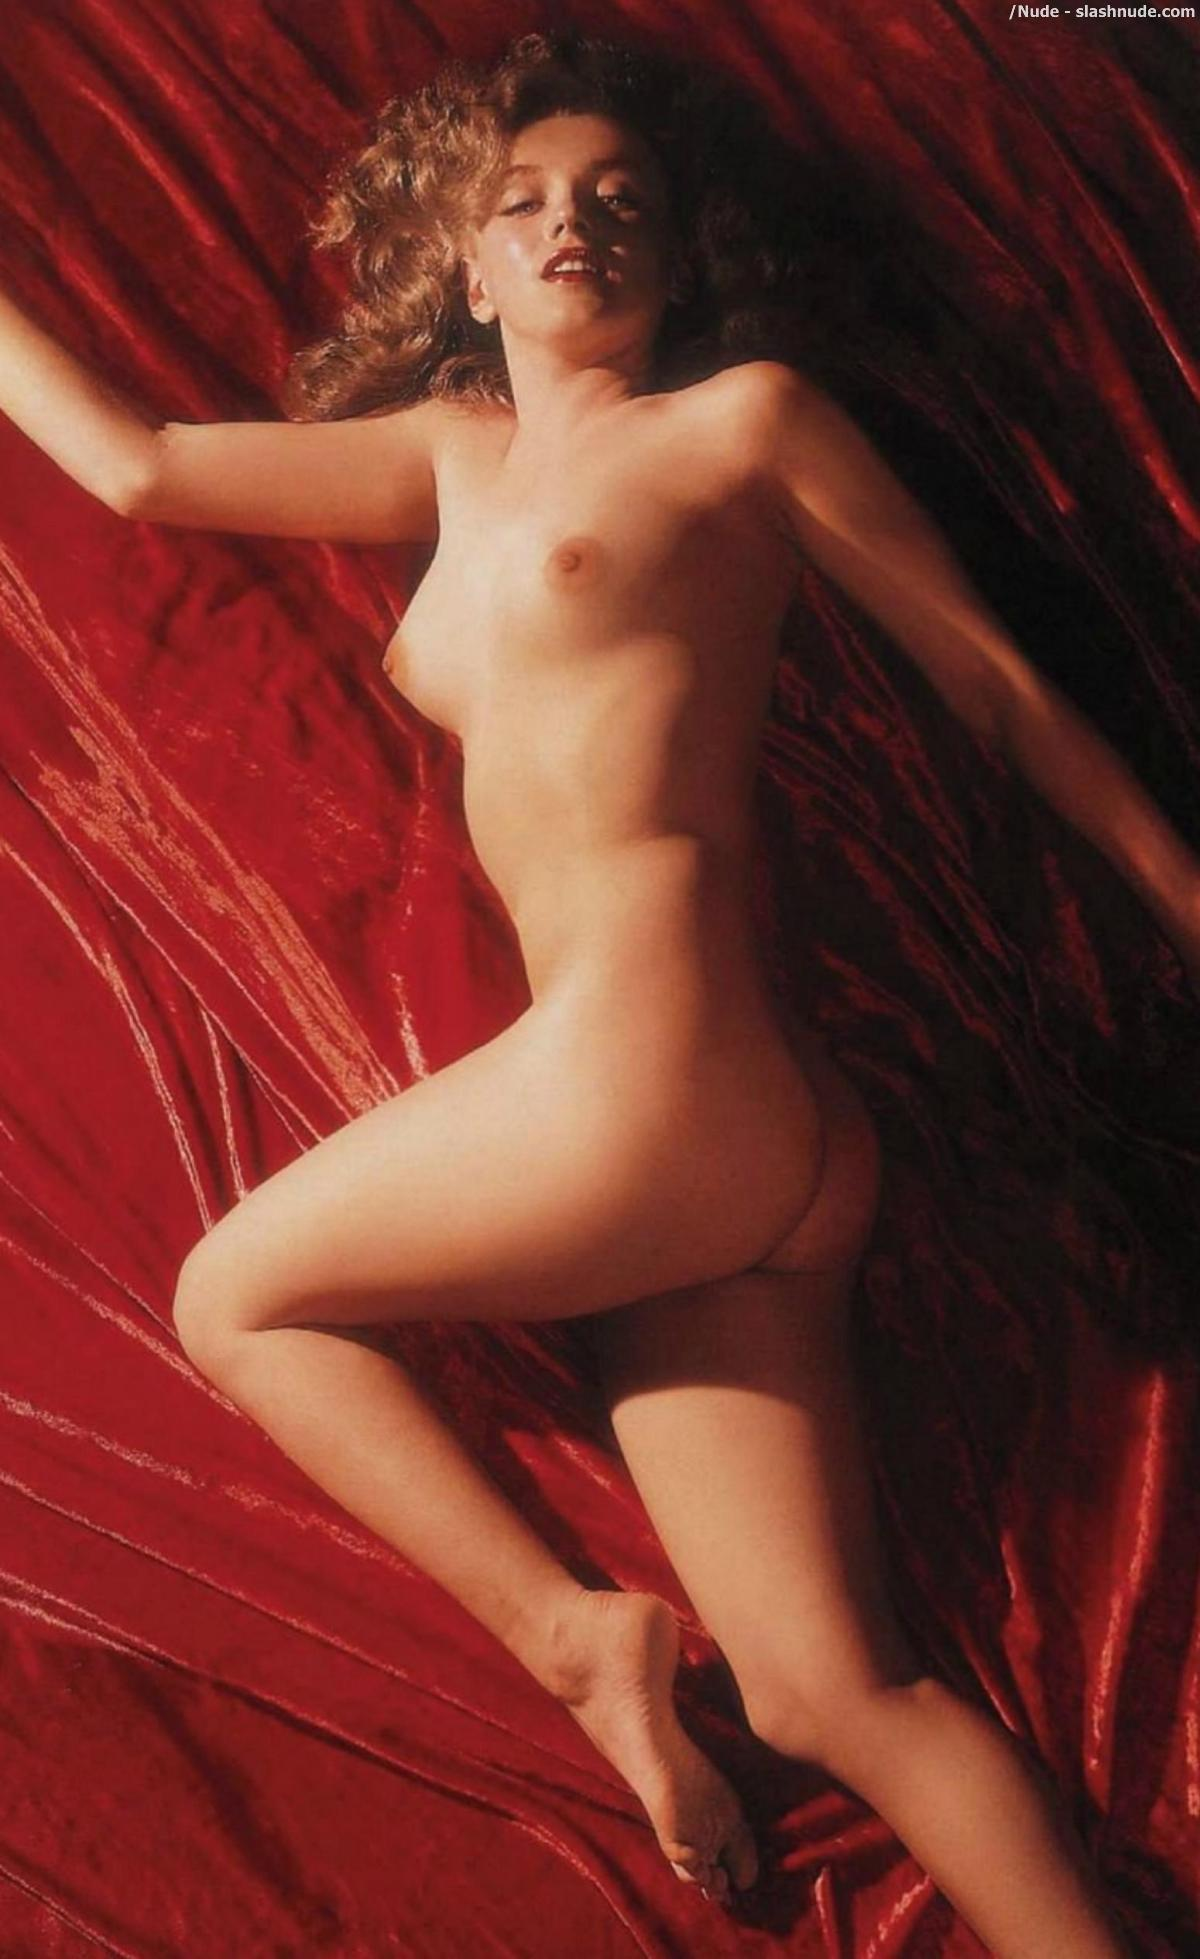 Idea marikyn monroe nude photo consider, that